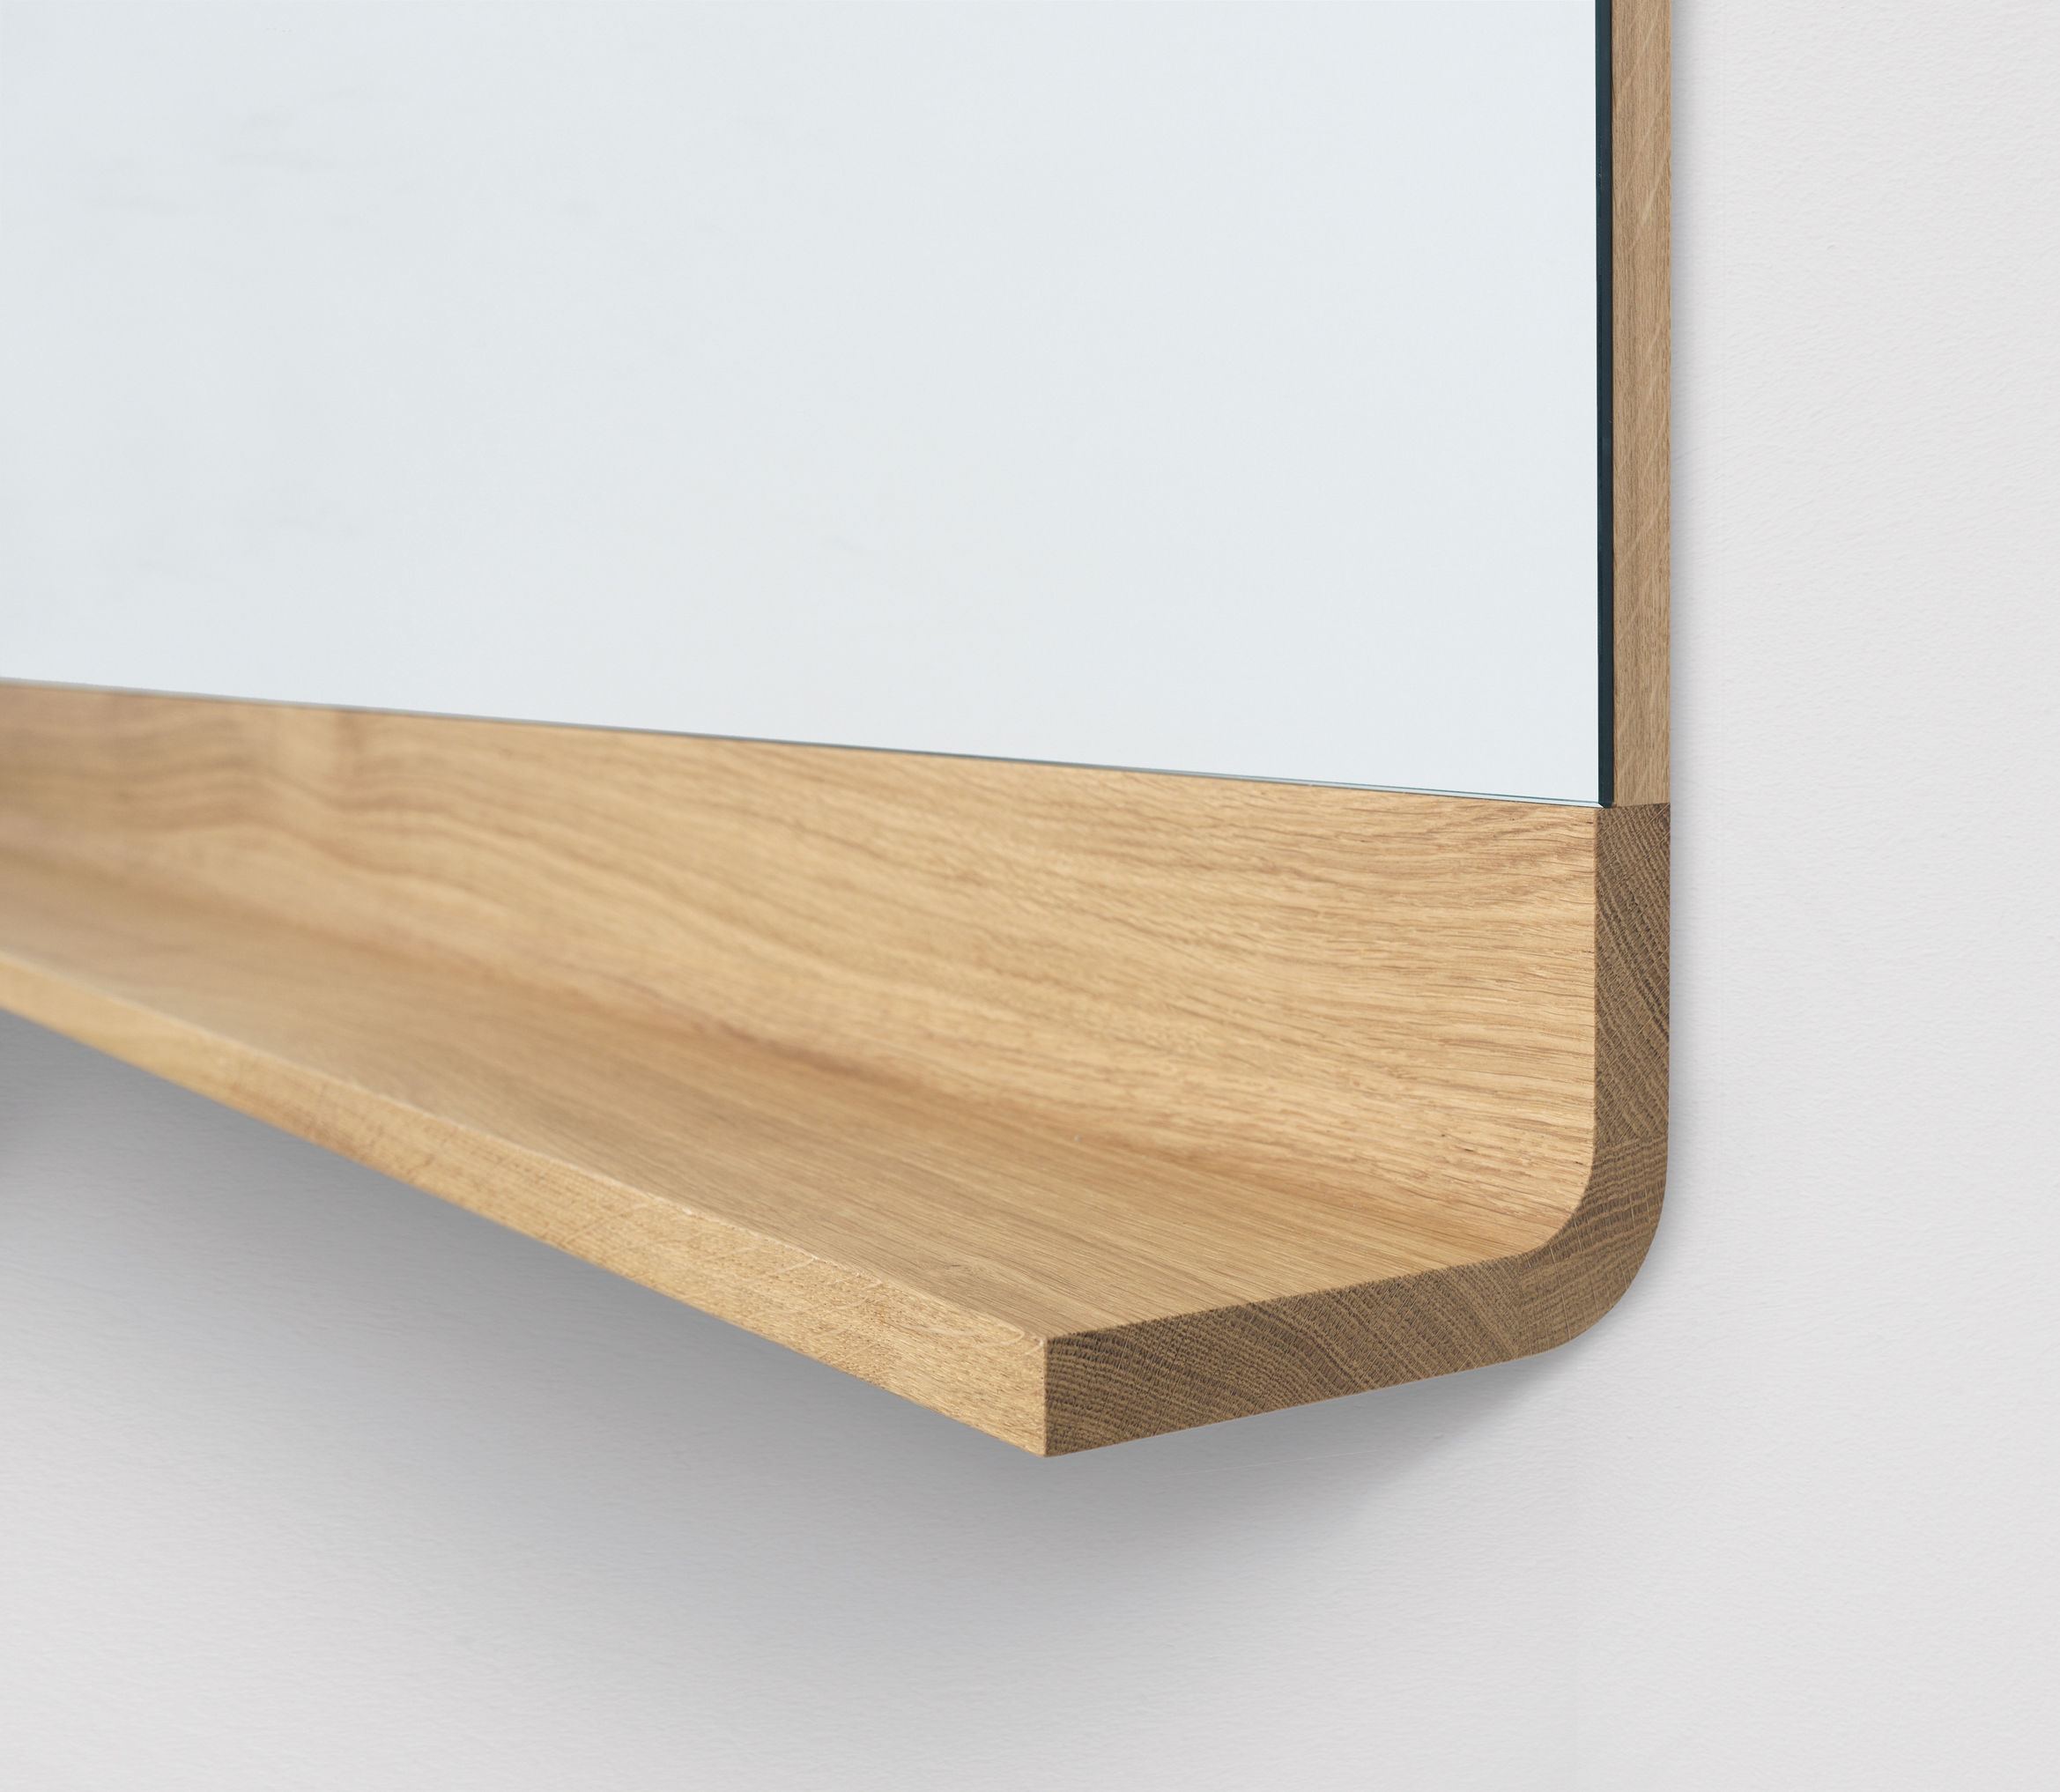 Miroir antlitz horizontal l 228 cm horizontal ch ne for Miroir horizontal design